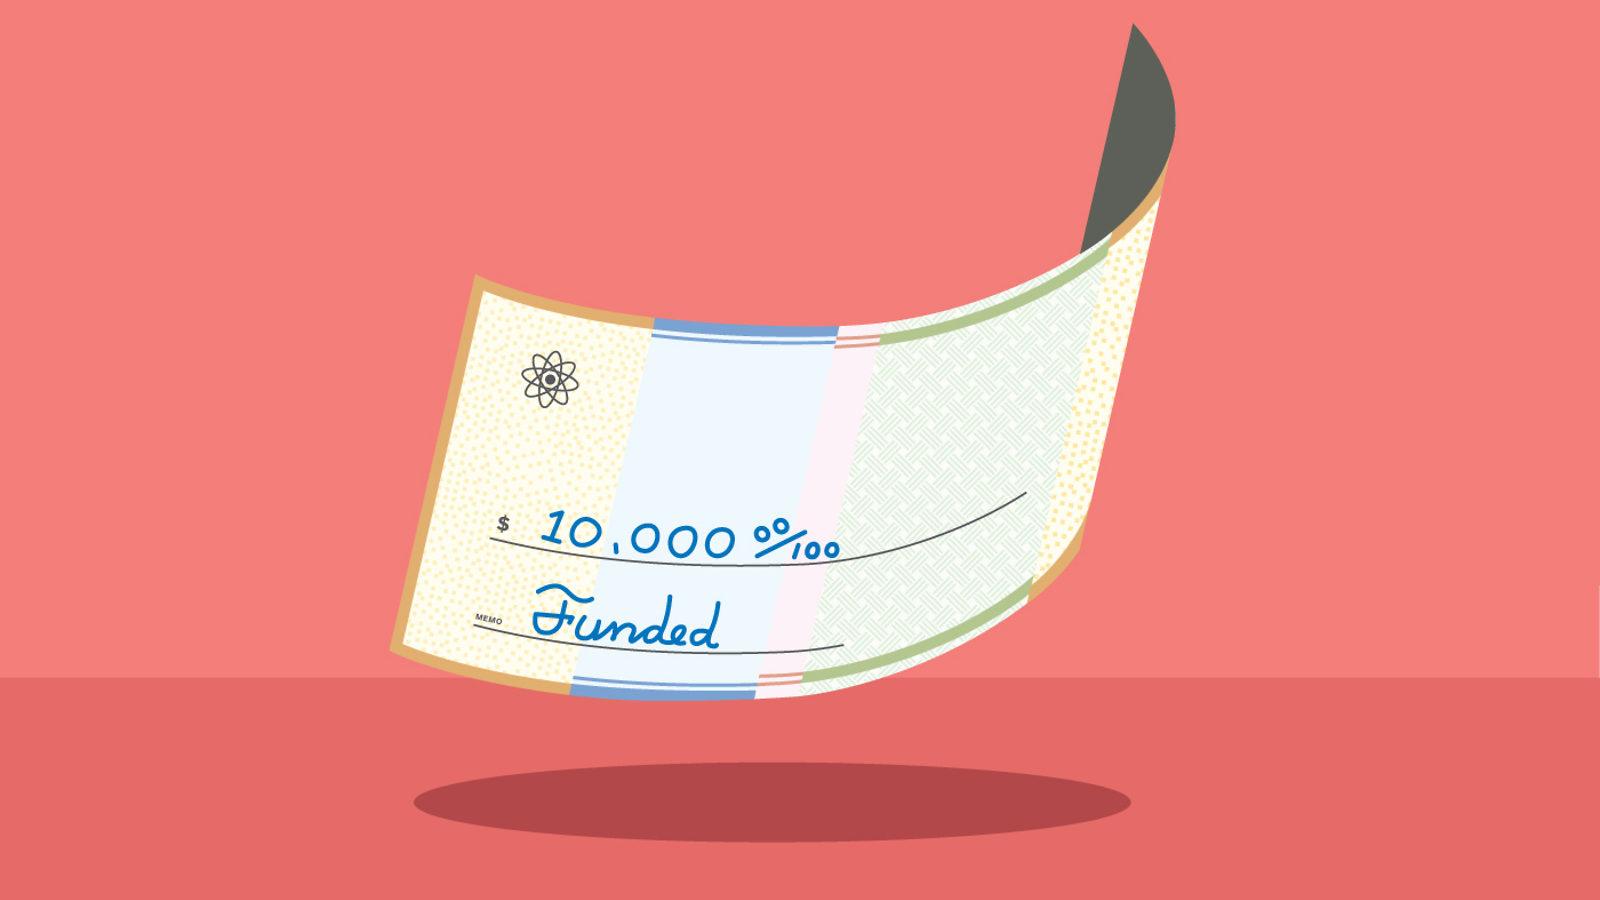 Illustration of Crowdfunding